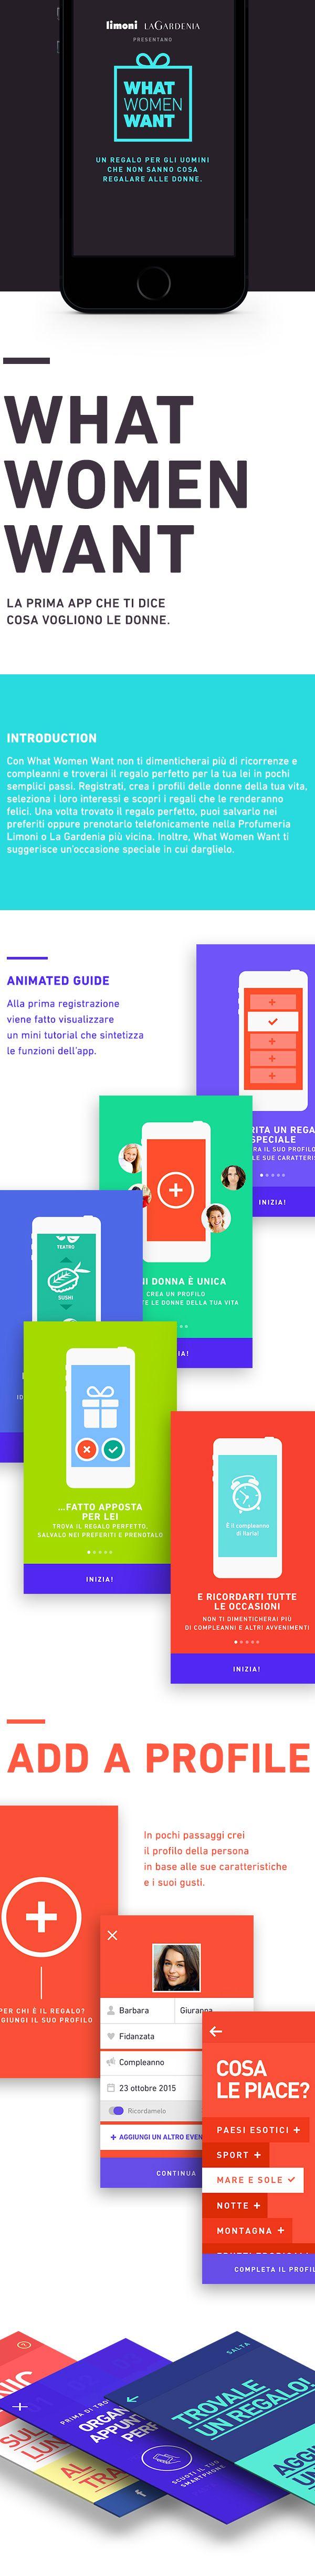 What Women Want by Limoni e La Gardenia - App on Behance